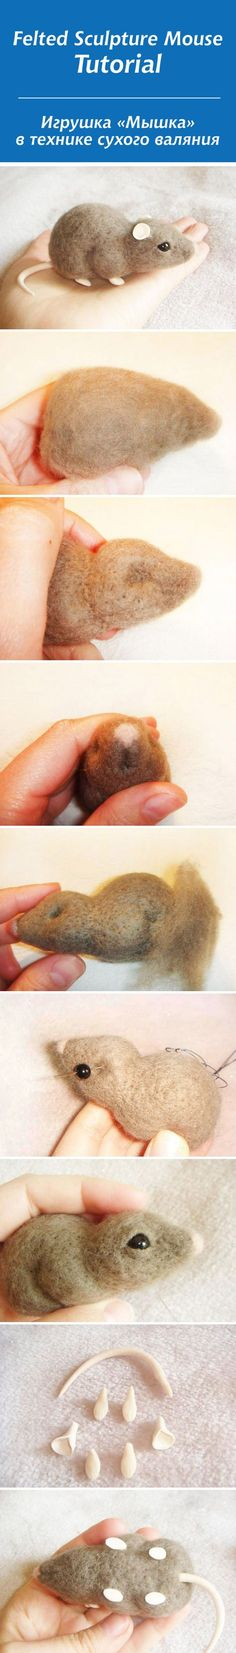 "Валяем из шерсти игрушку ""Мышку"" #felting"